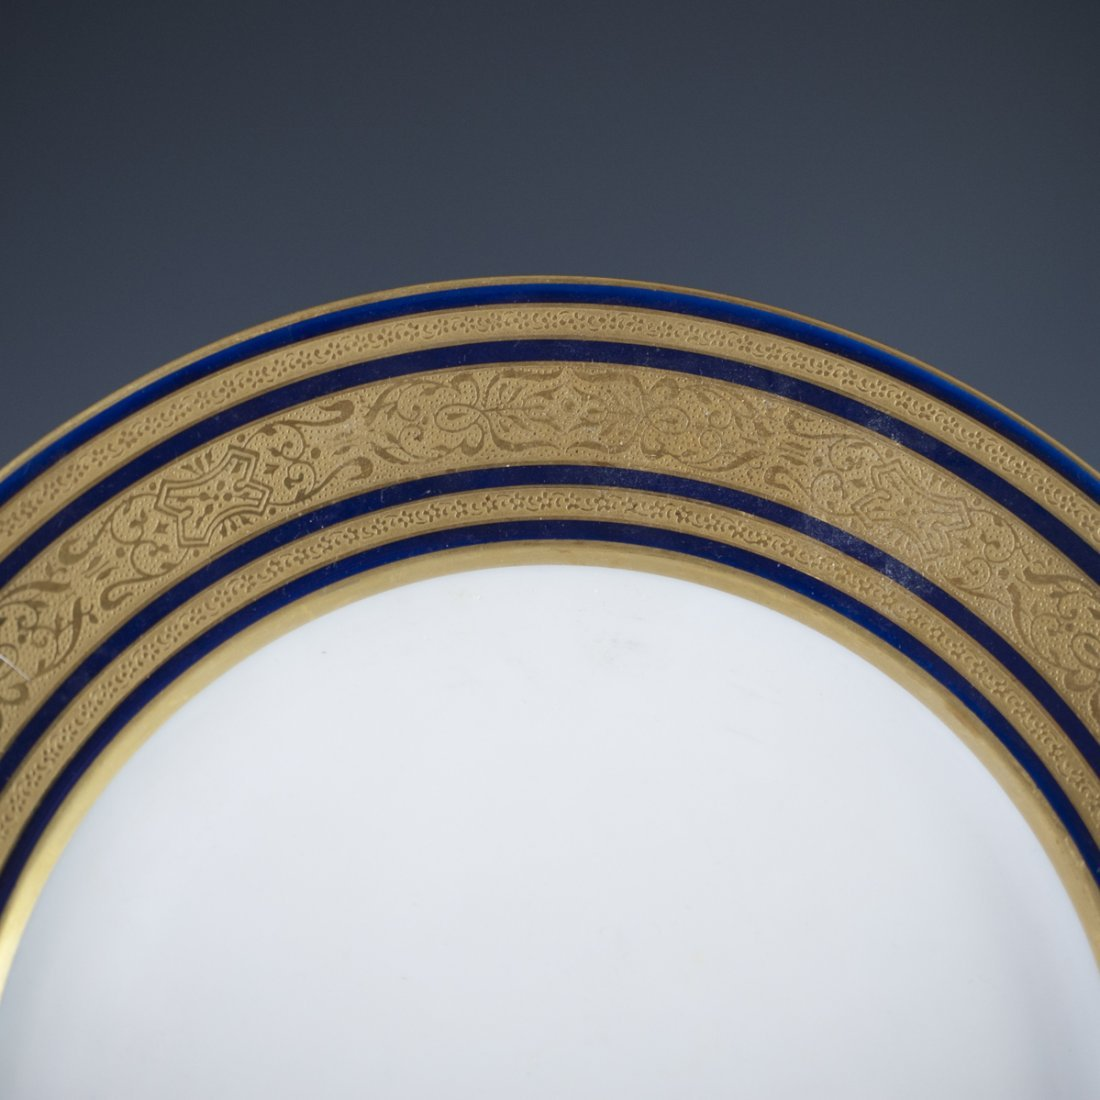 Charles Ahrenfeldt Limoges Cobalt Plates - 2